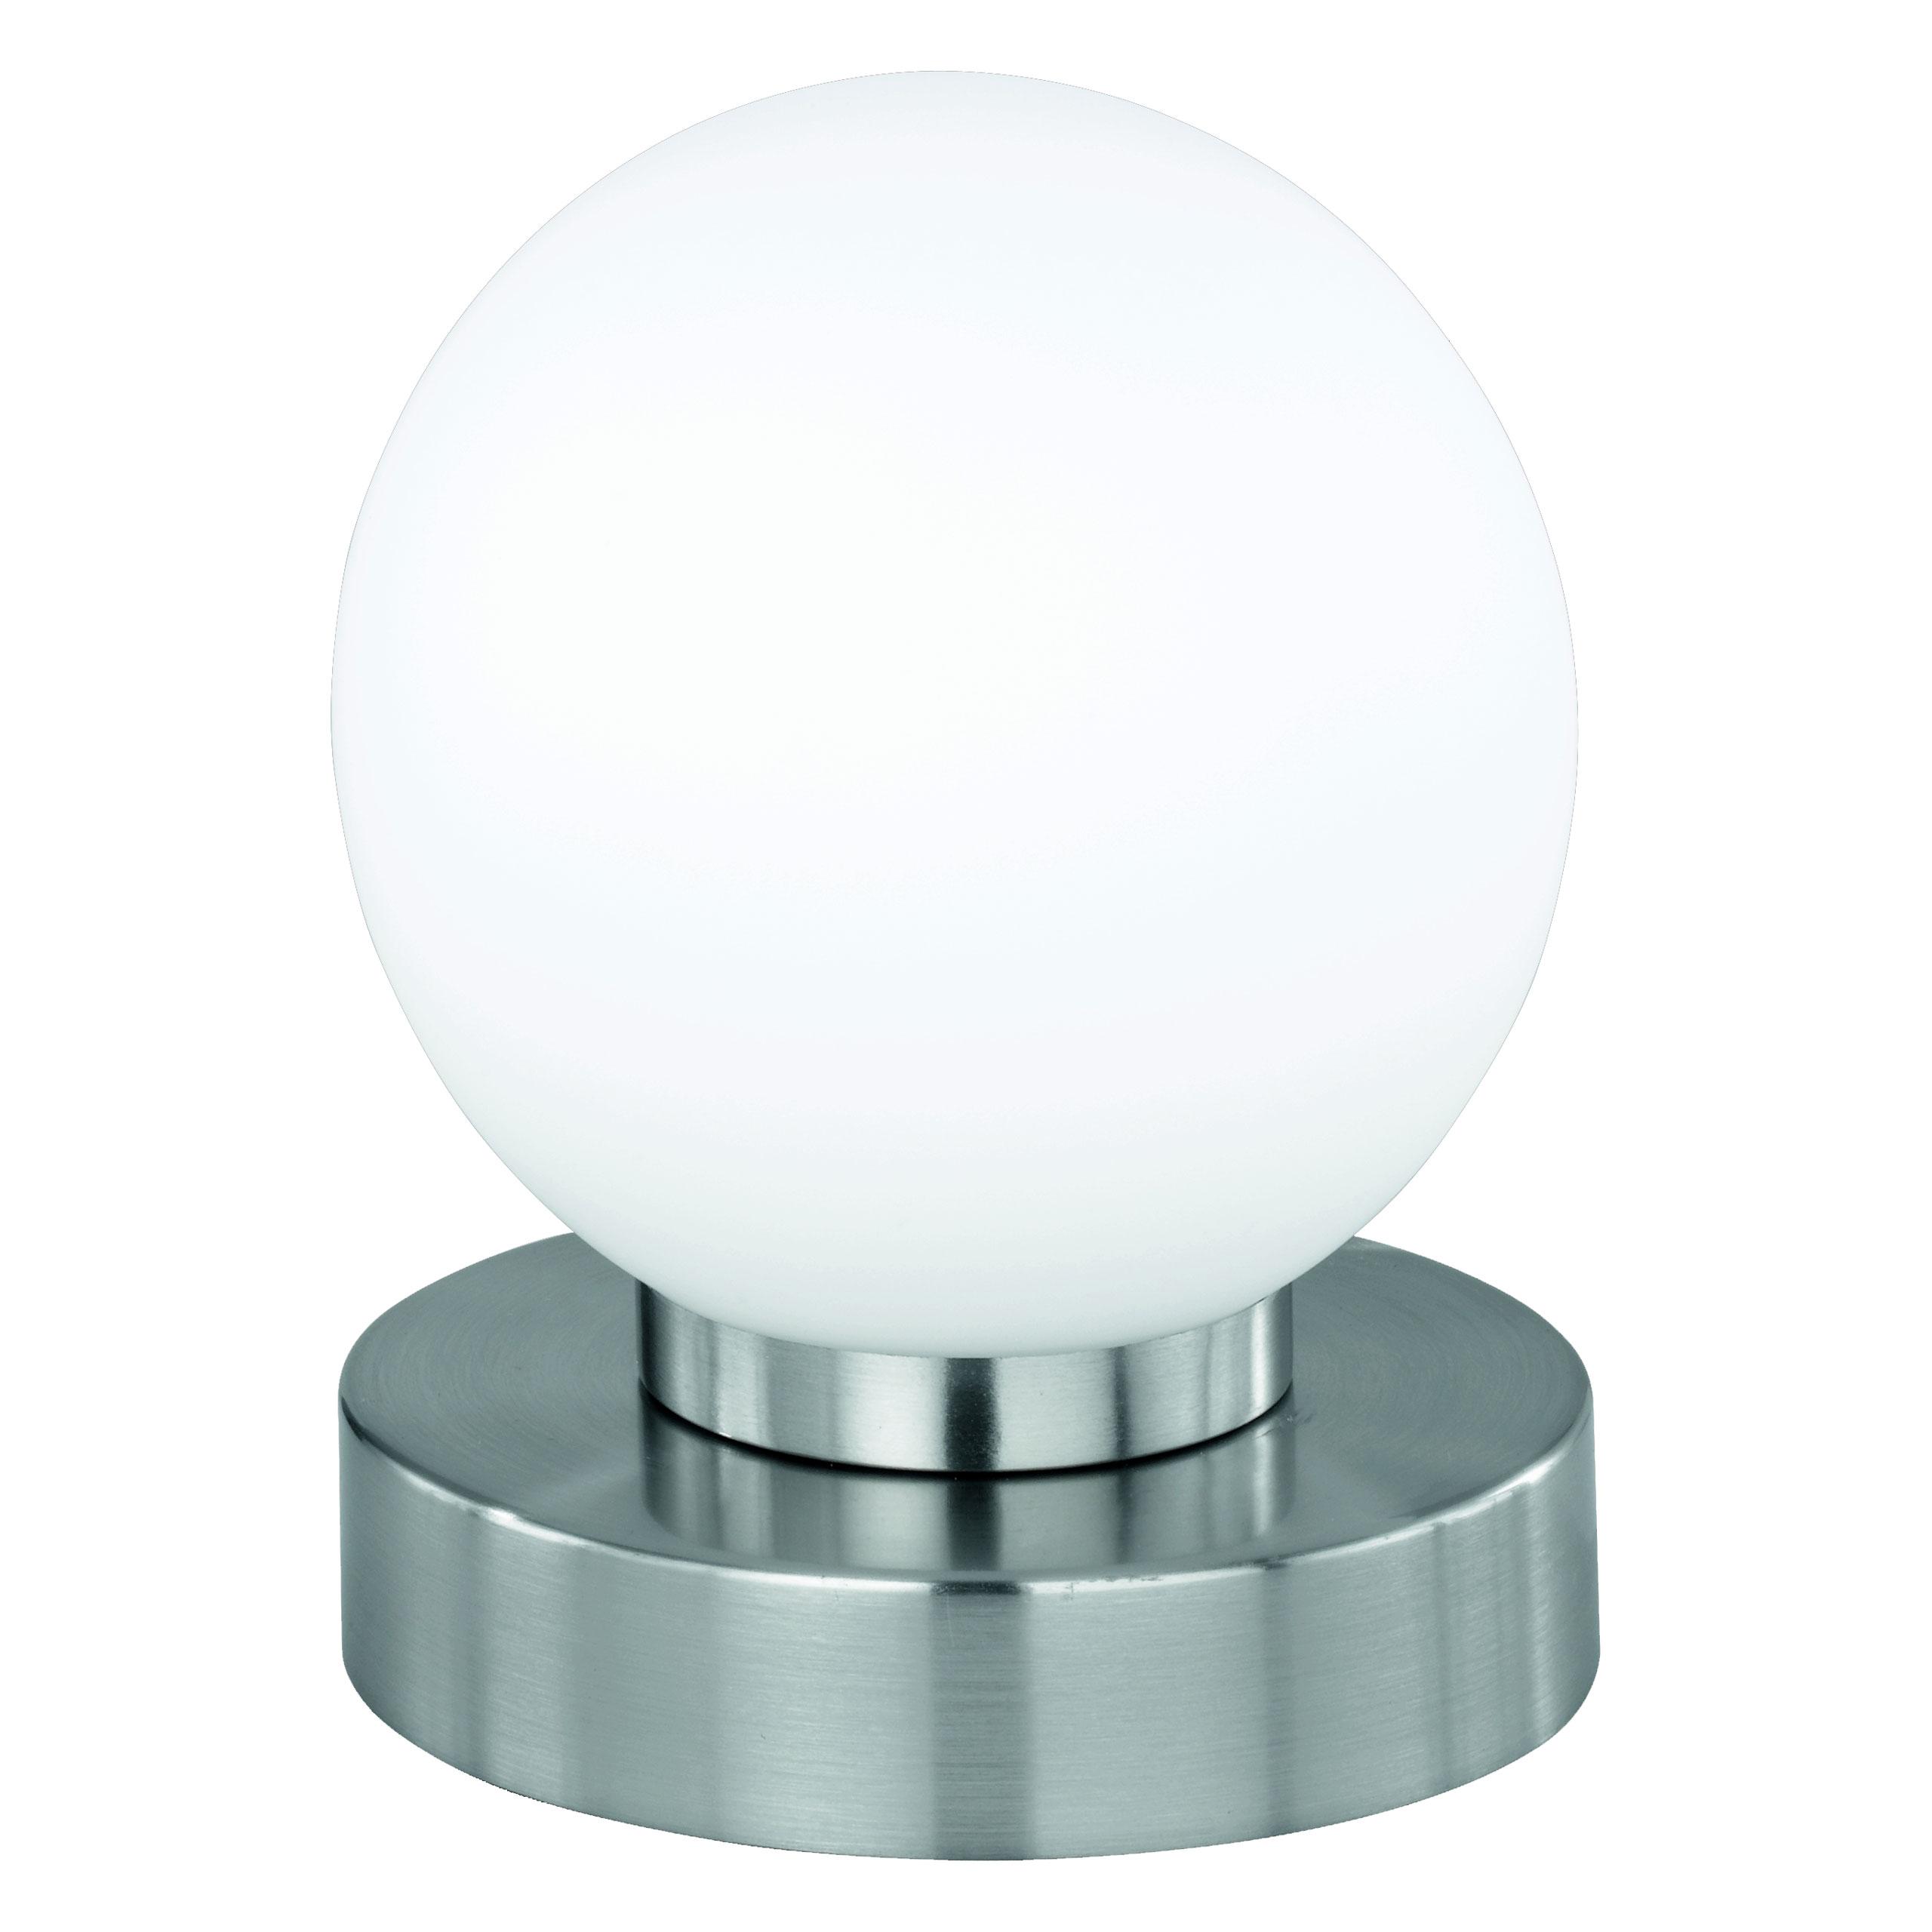 reality trio kugellampe lampe tischleuchte touch me dimmer nickel matt glas opal wei. Black Bedroom Furniture Sets. Home Design Ideas